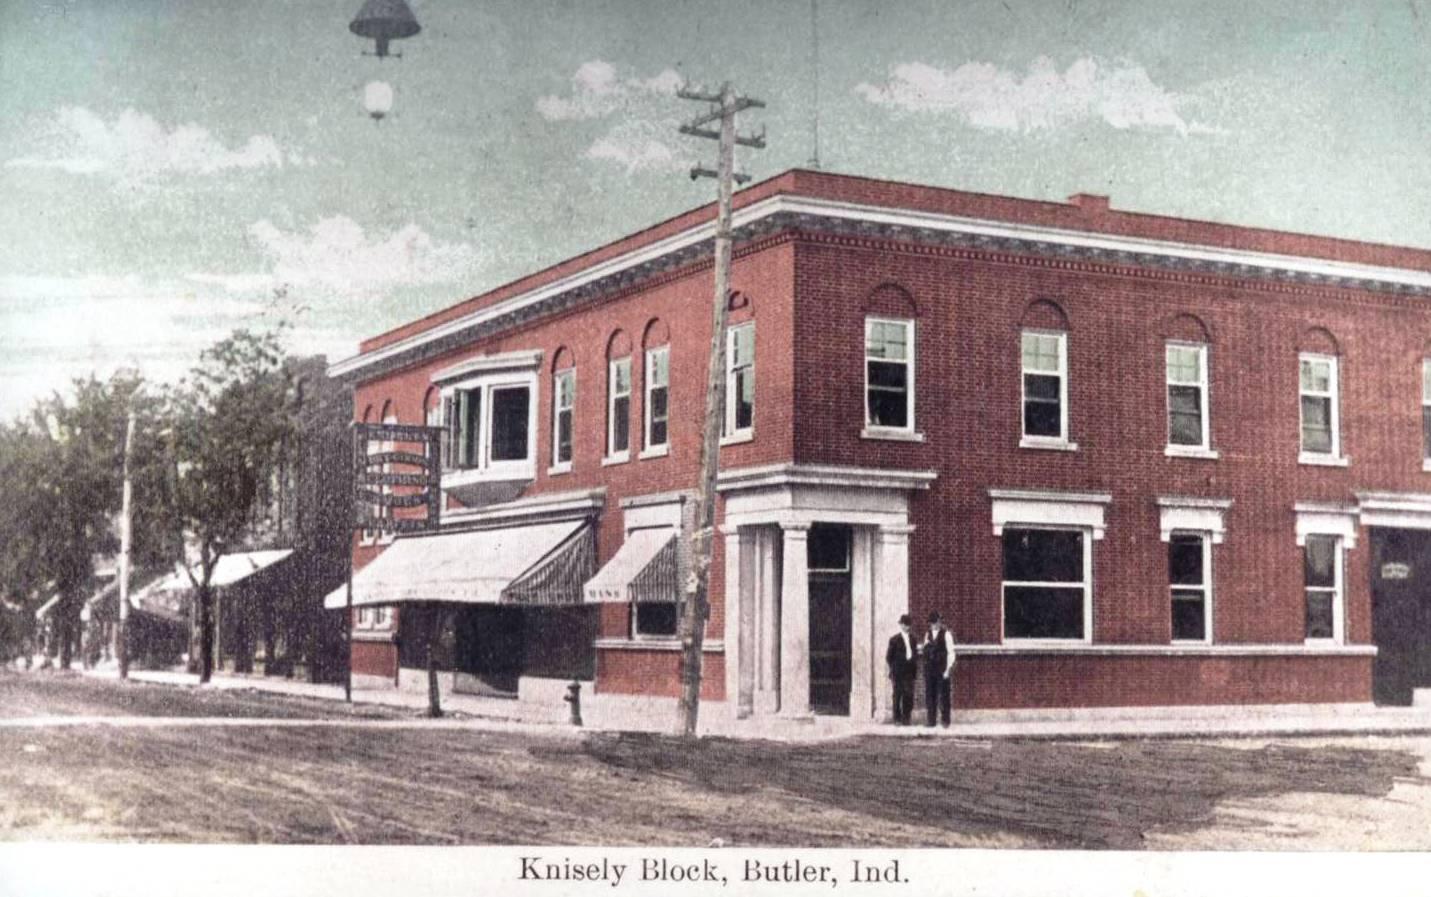 08-knisley_block_butler